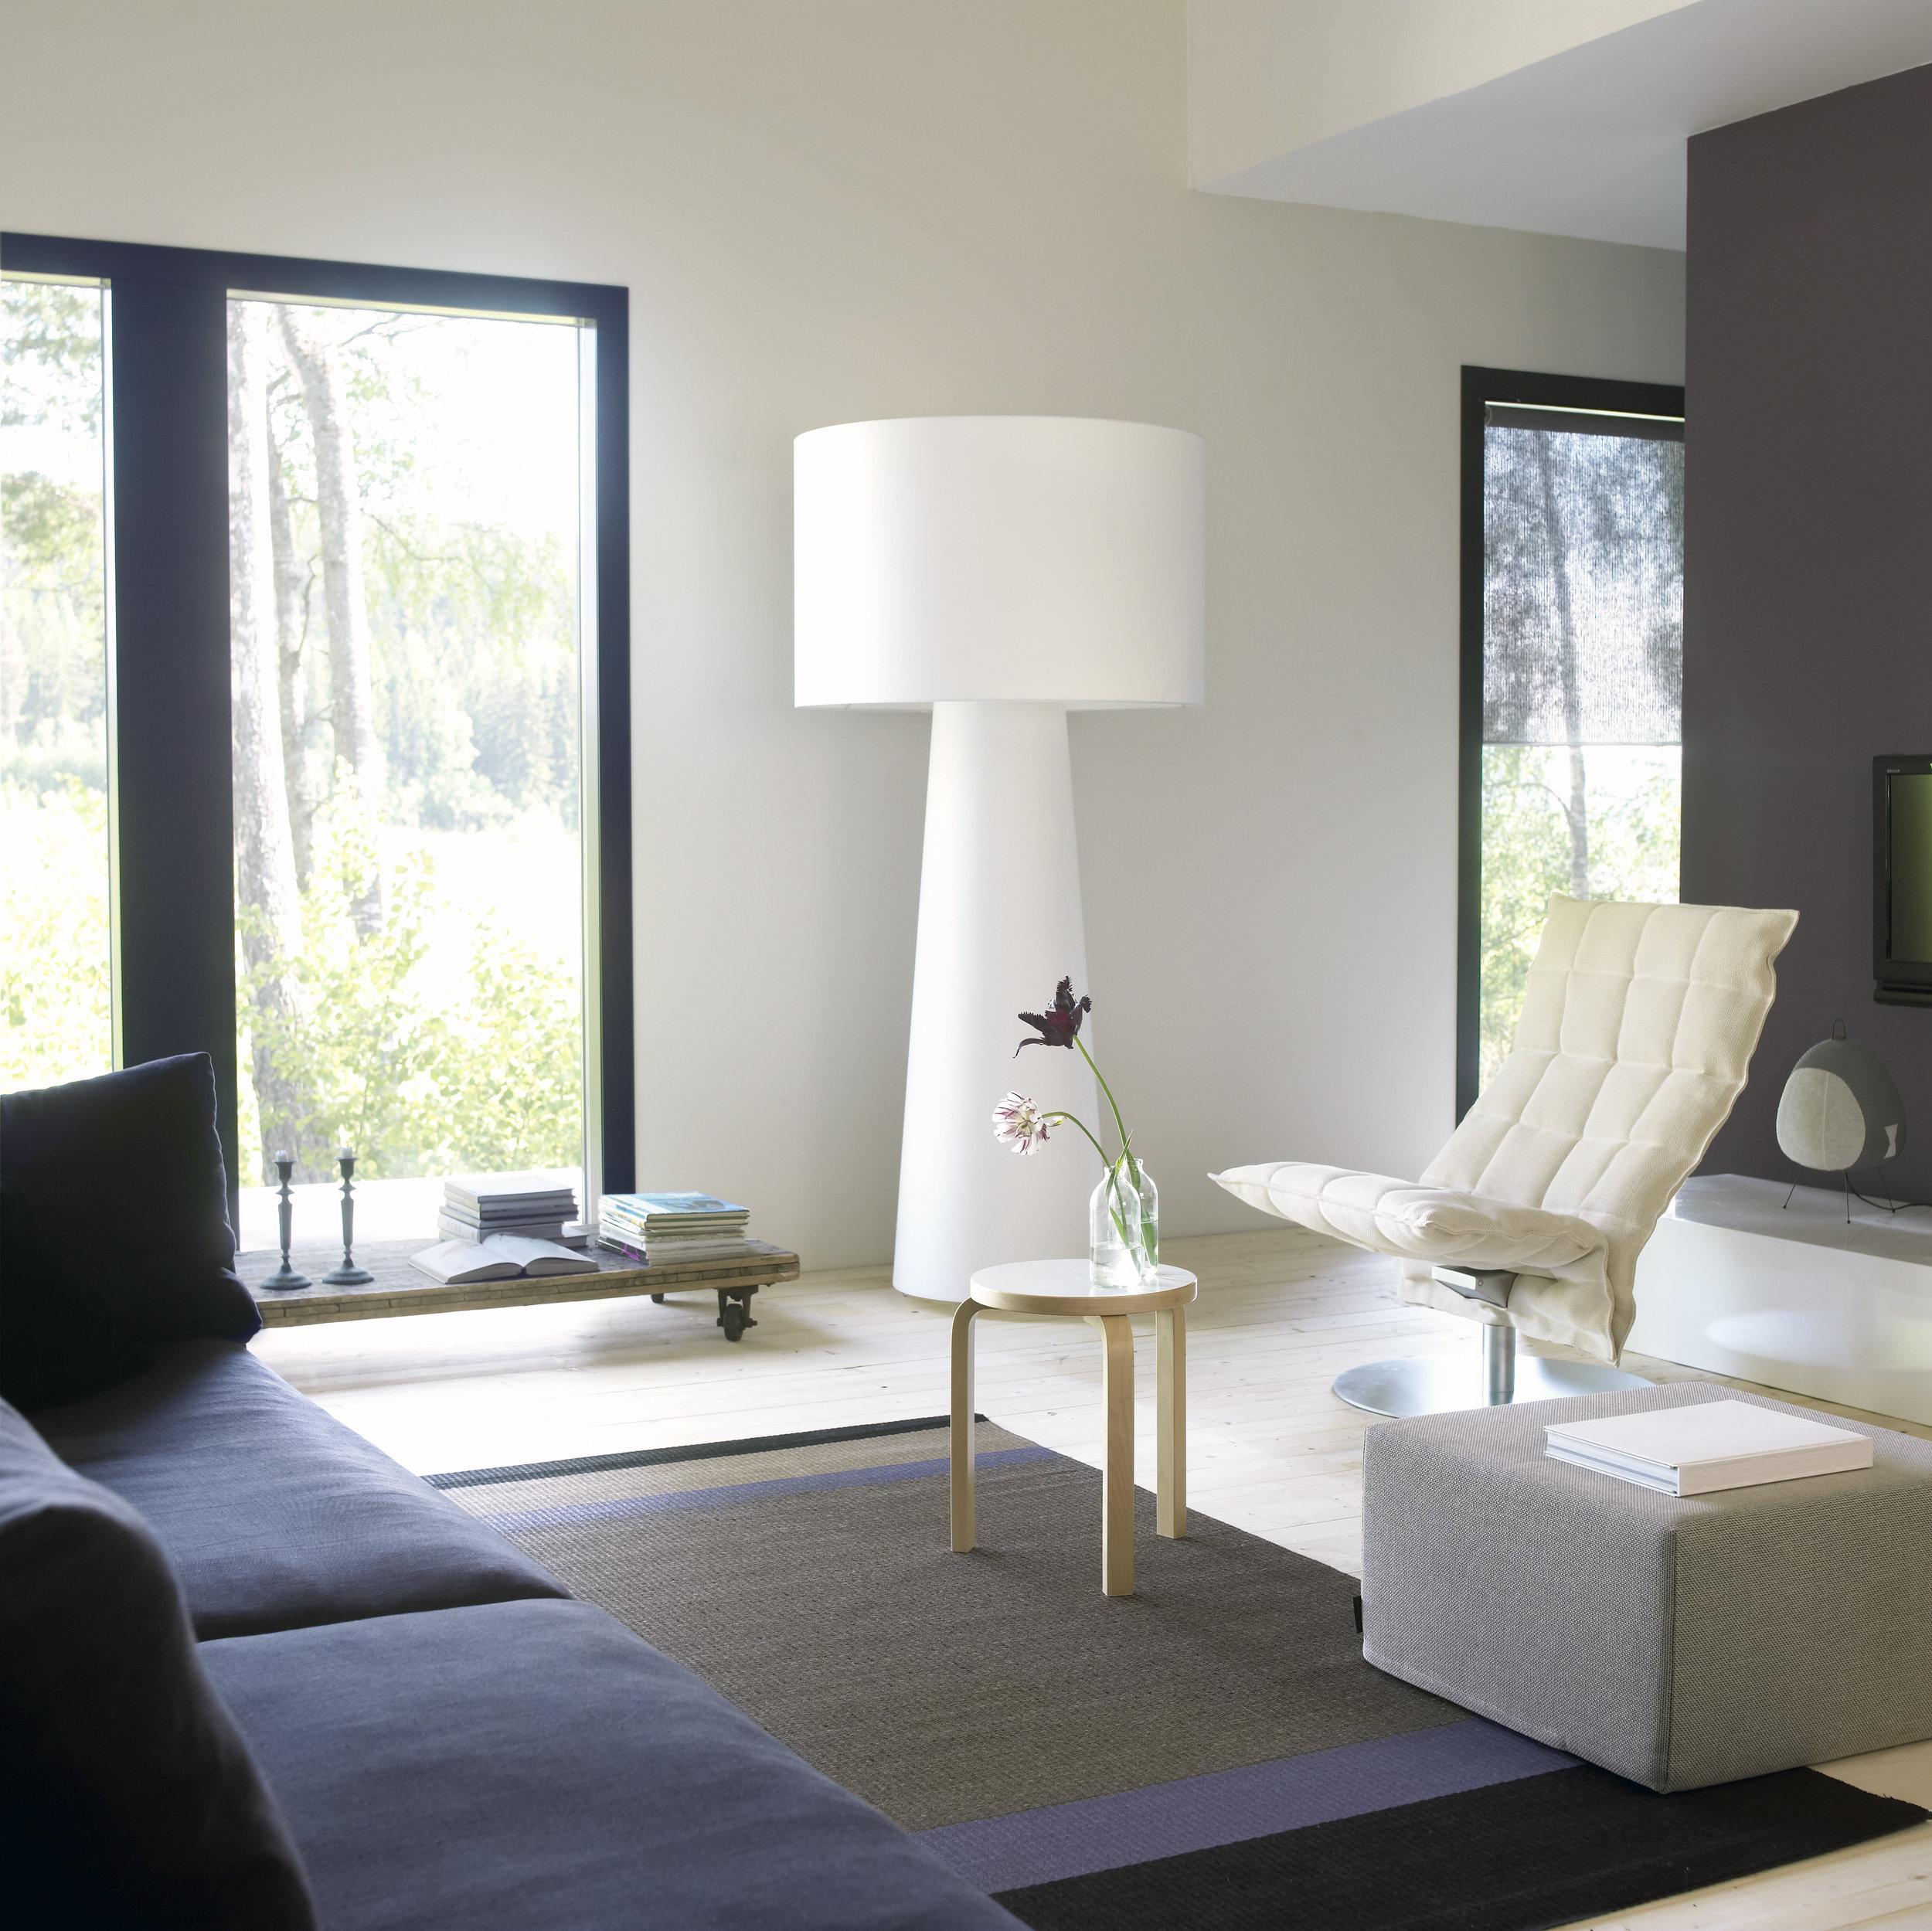 1330919  Panorama  black-antique paper yarn carpet, Narrow Swivel k Chair, 435 Cool cushion